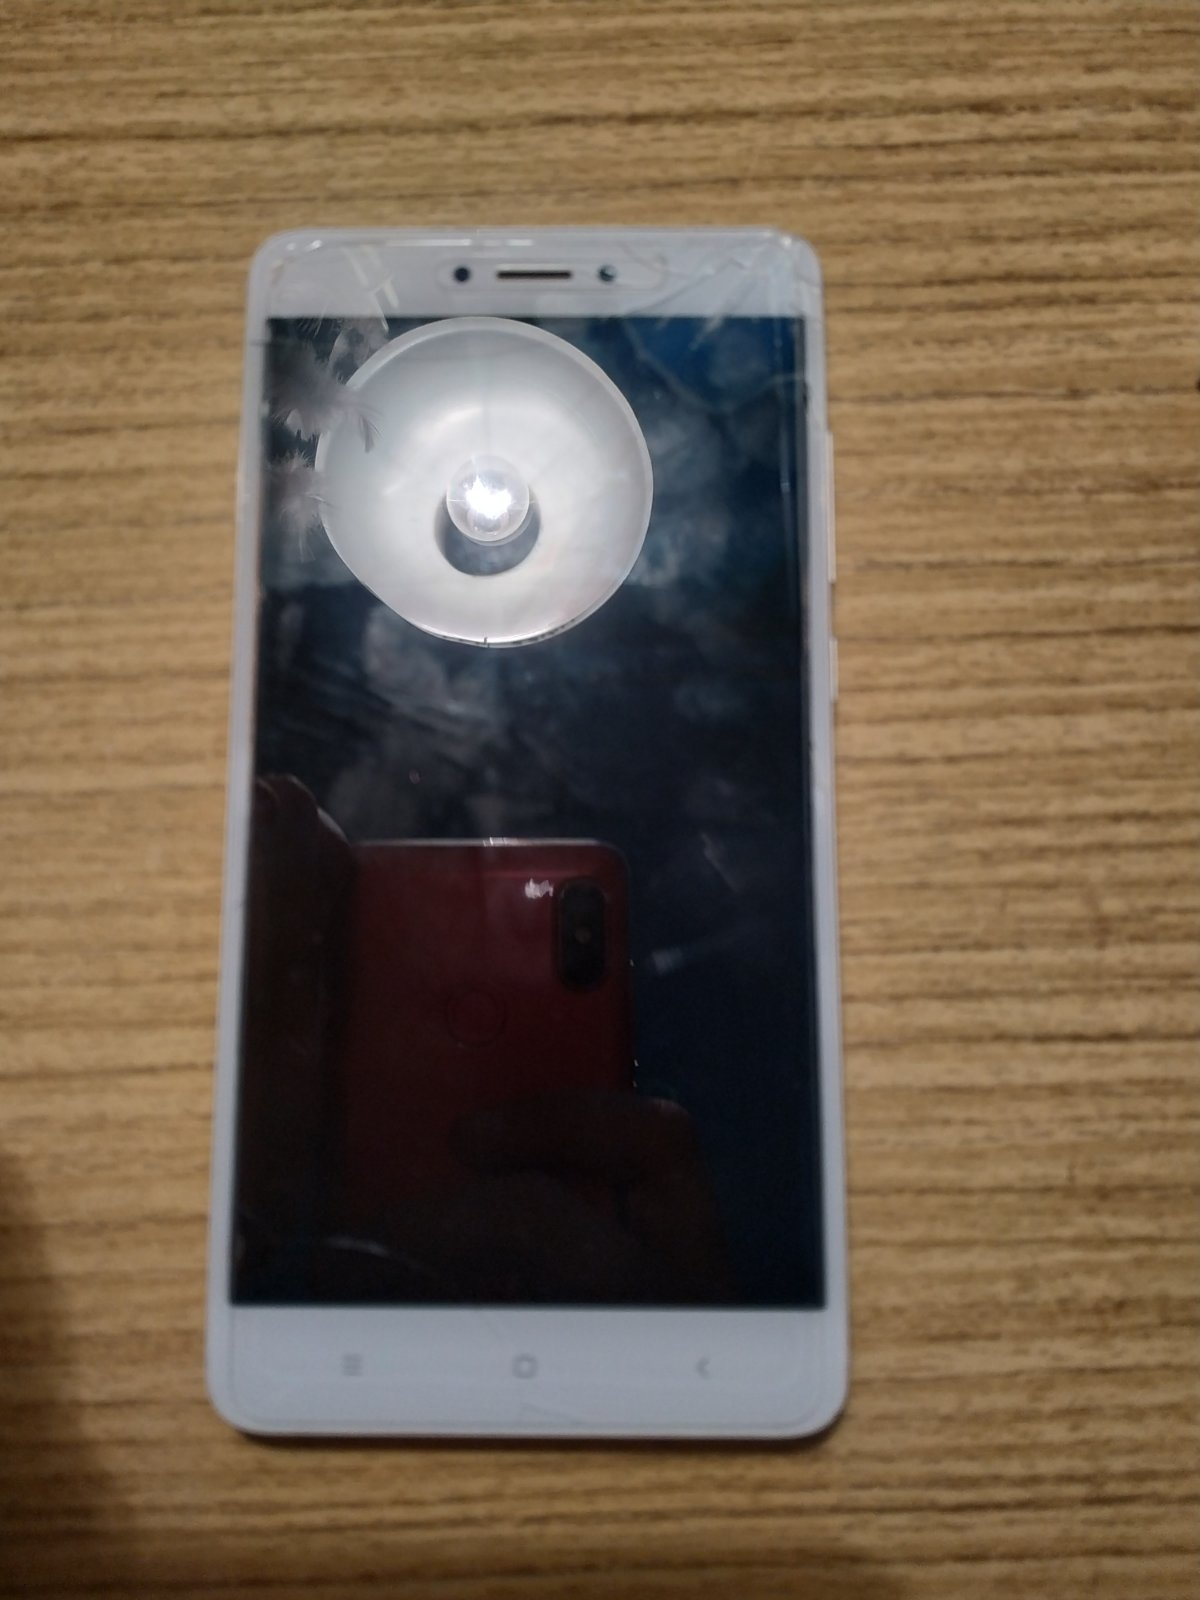 Xiaomi redmi note 4 xiaomi 50 € od predávajºcej Detsk½ bazár